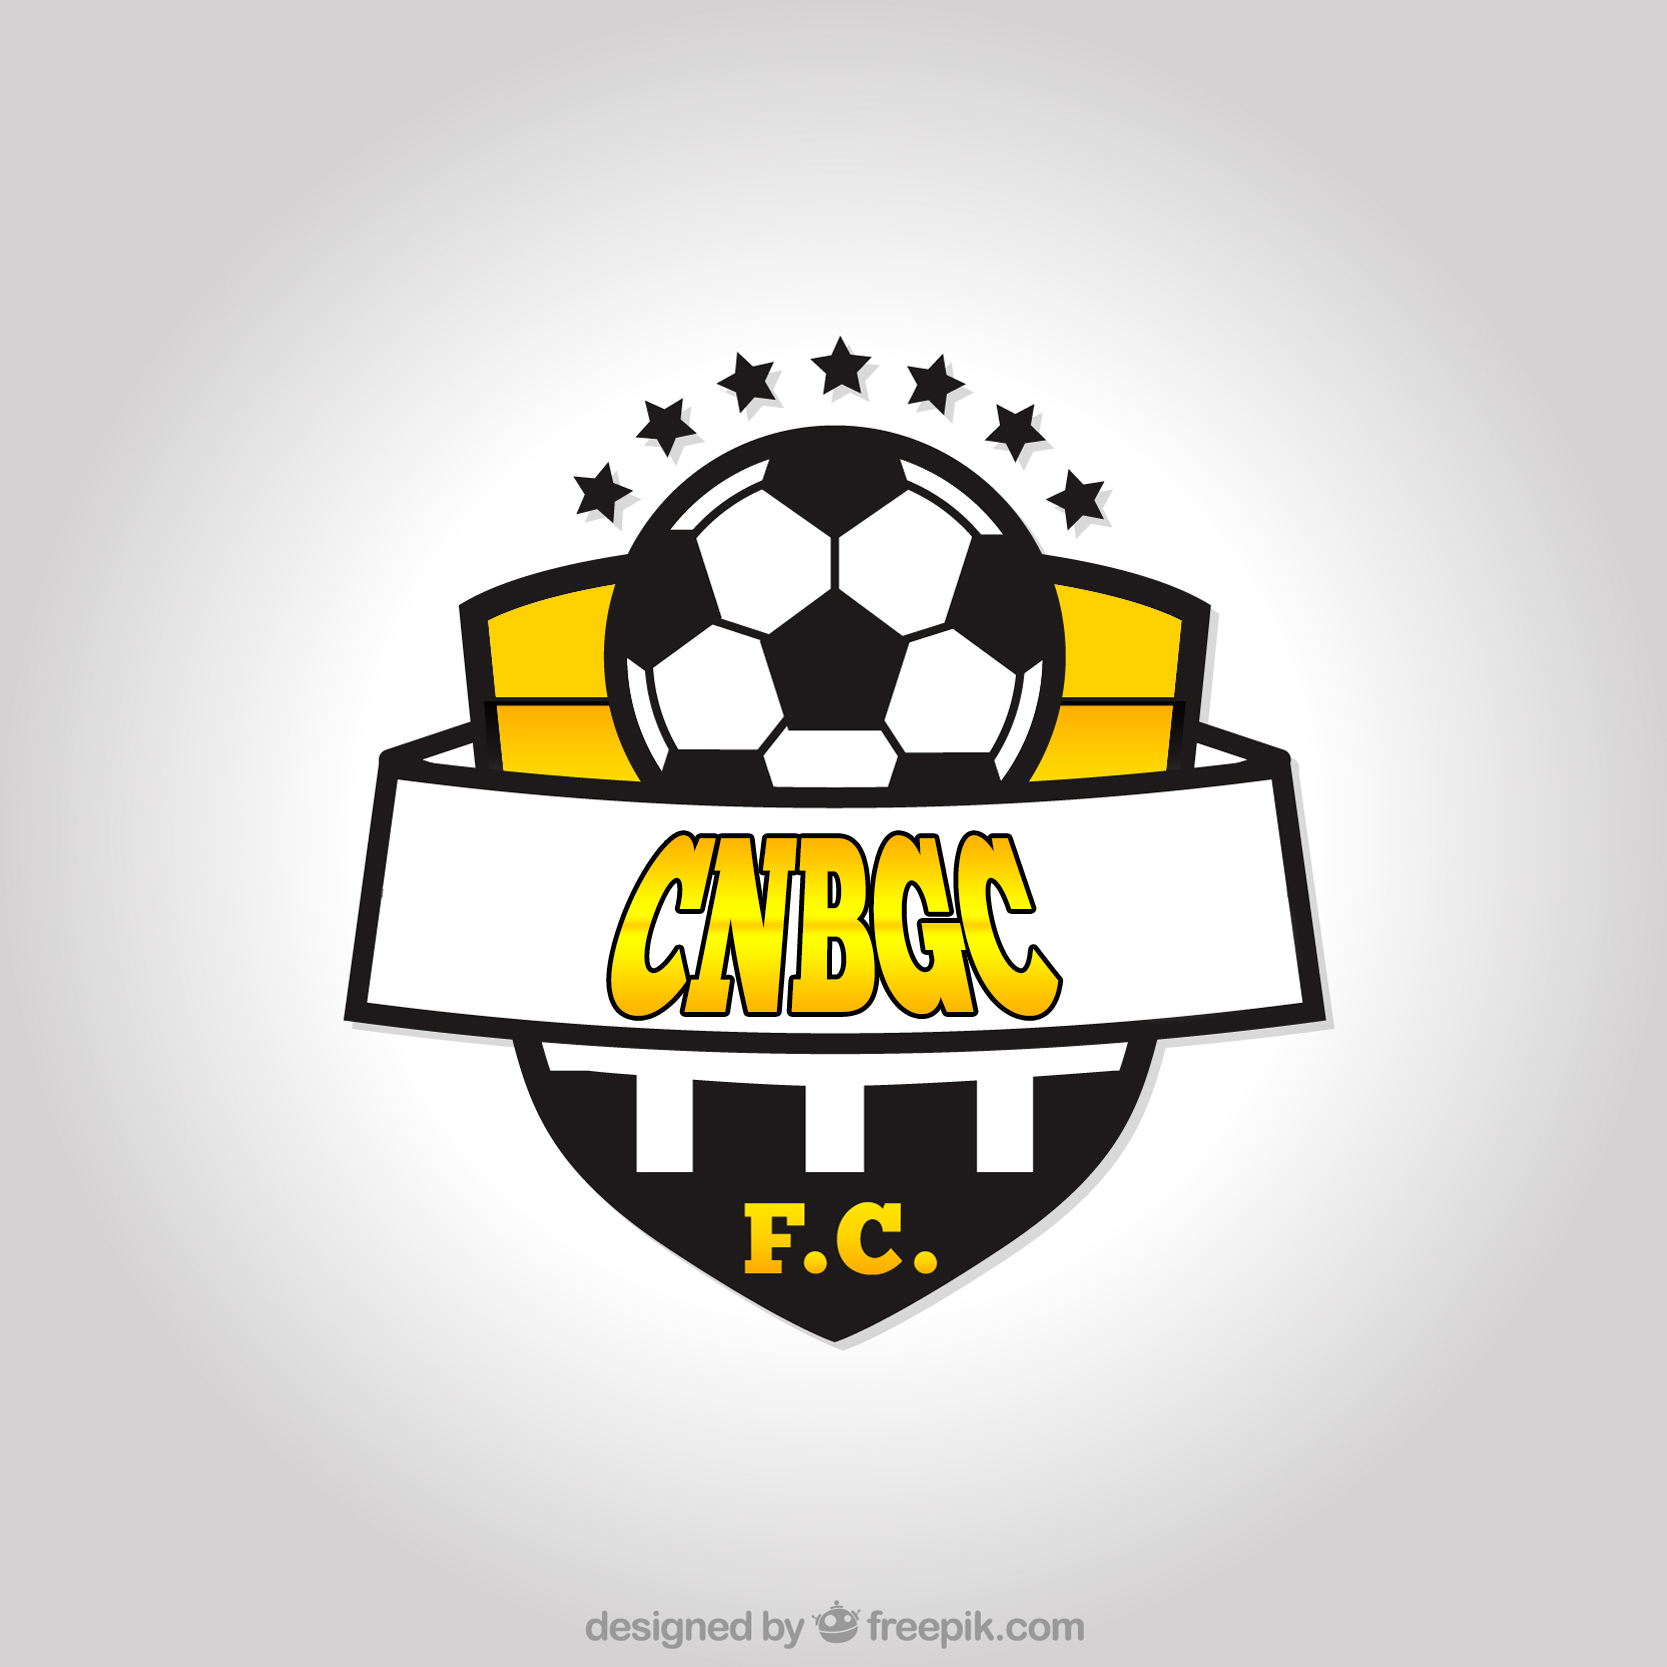 CNBGC